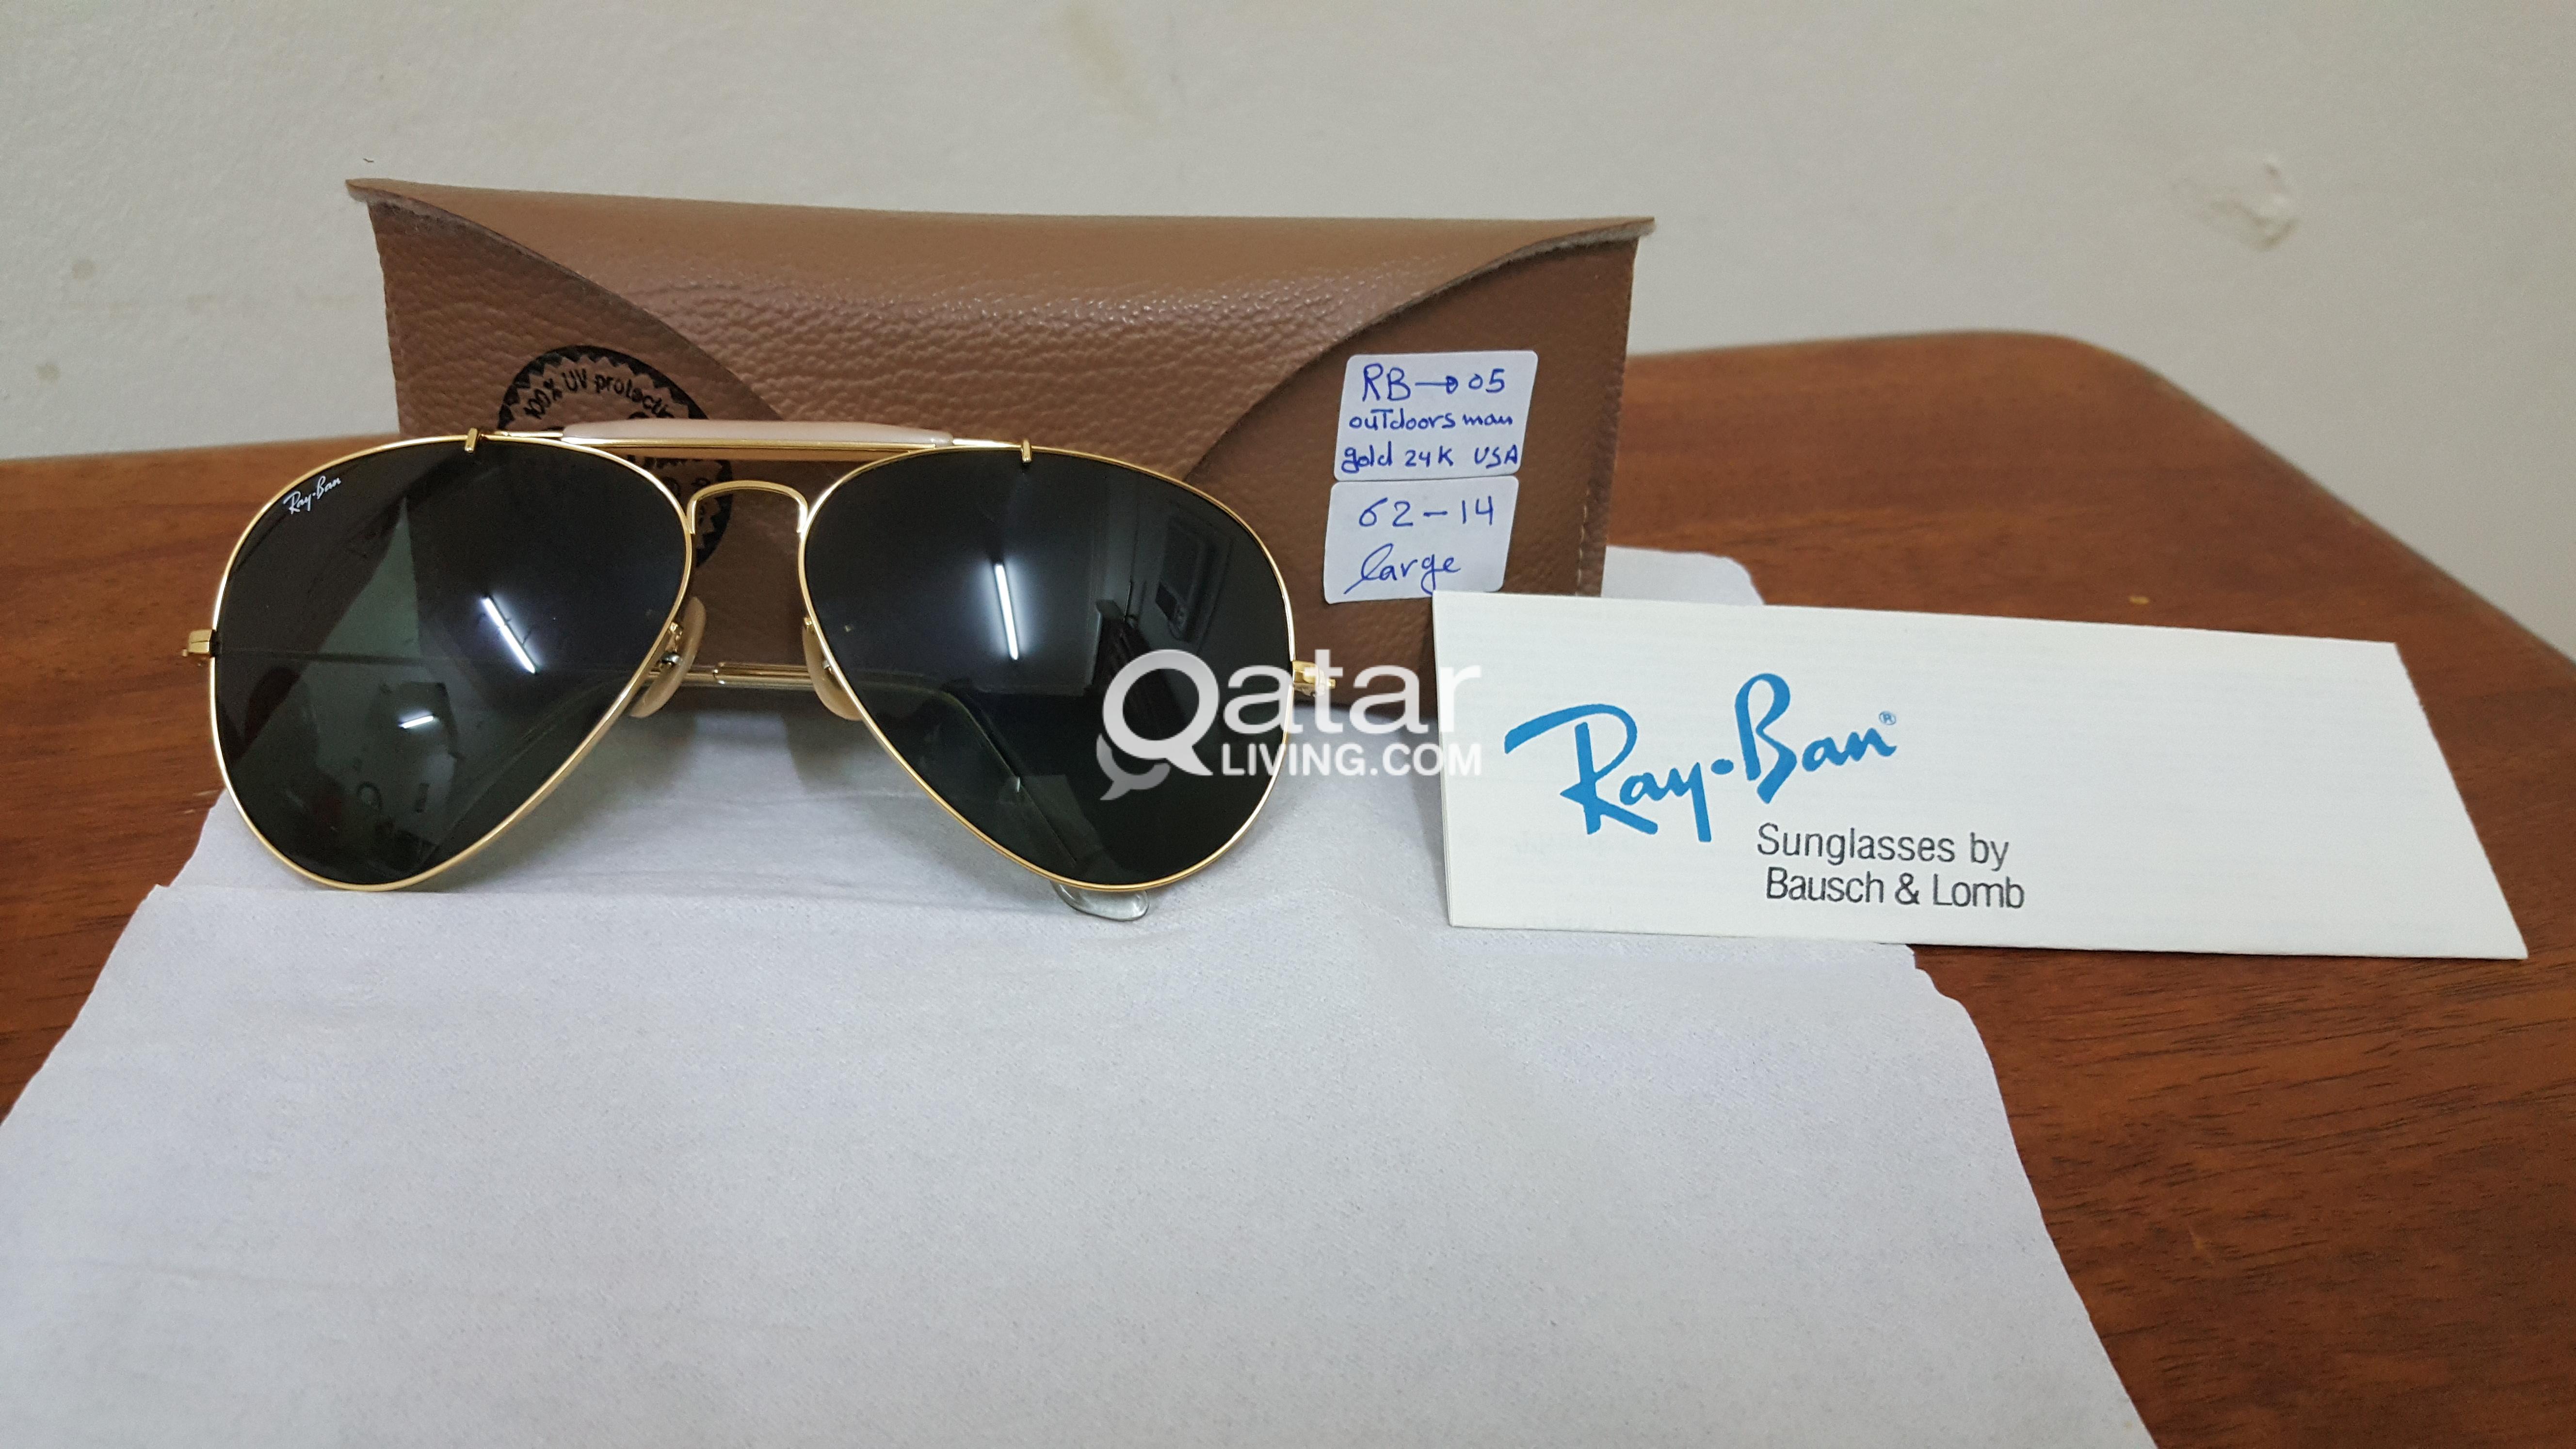 72ab459377 title  title  title  title  title  title  title. Information. original  vintage ray ban sunglasses USA description and price .